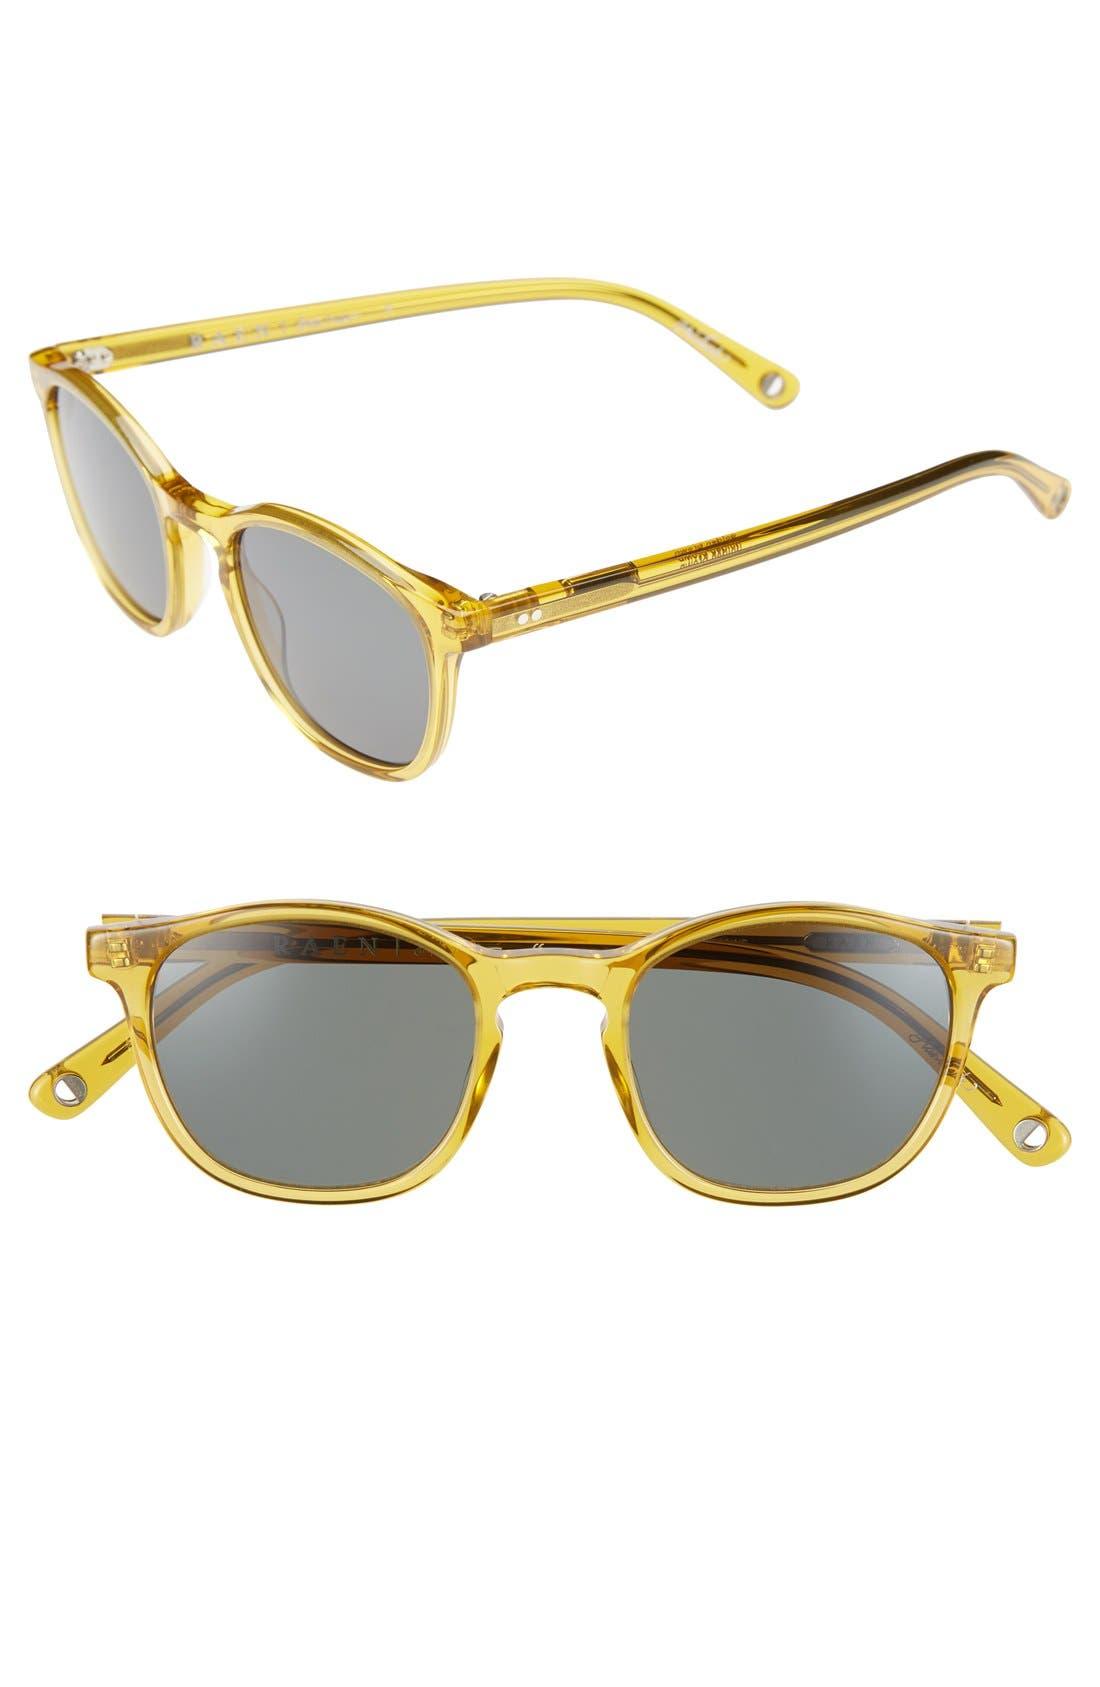 Main Image - RAEN 'St. Malo' 48mm Sunglasses